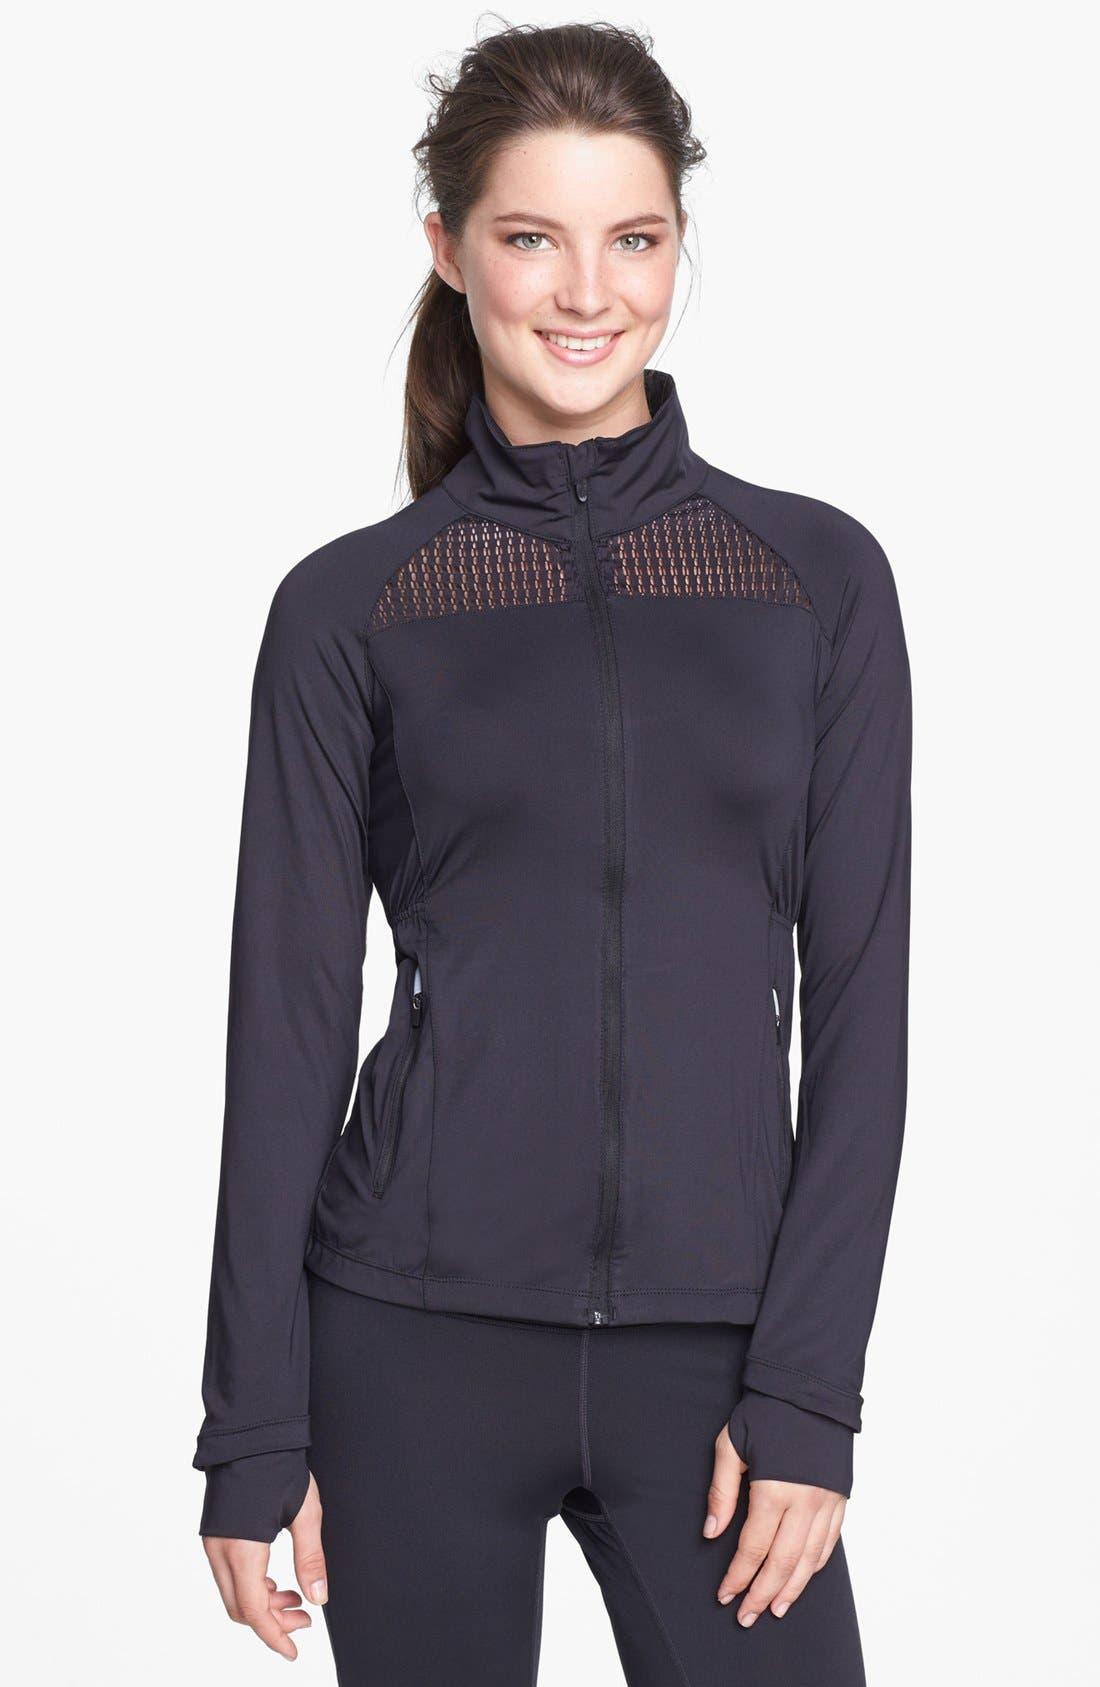 Main Image - ASICS® 'Kelowna' Jacket